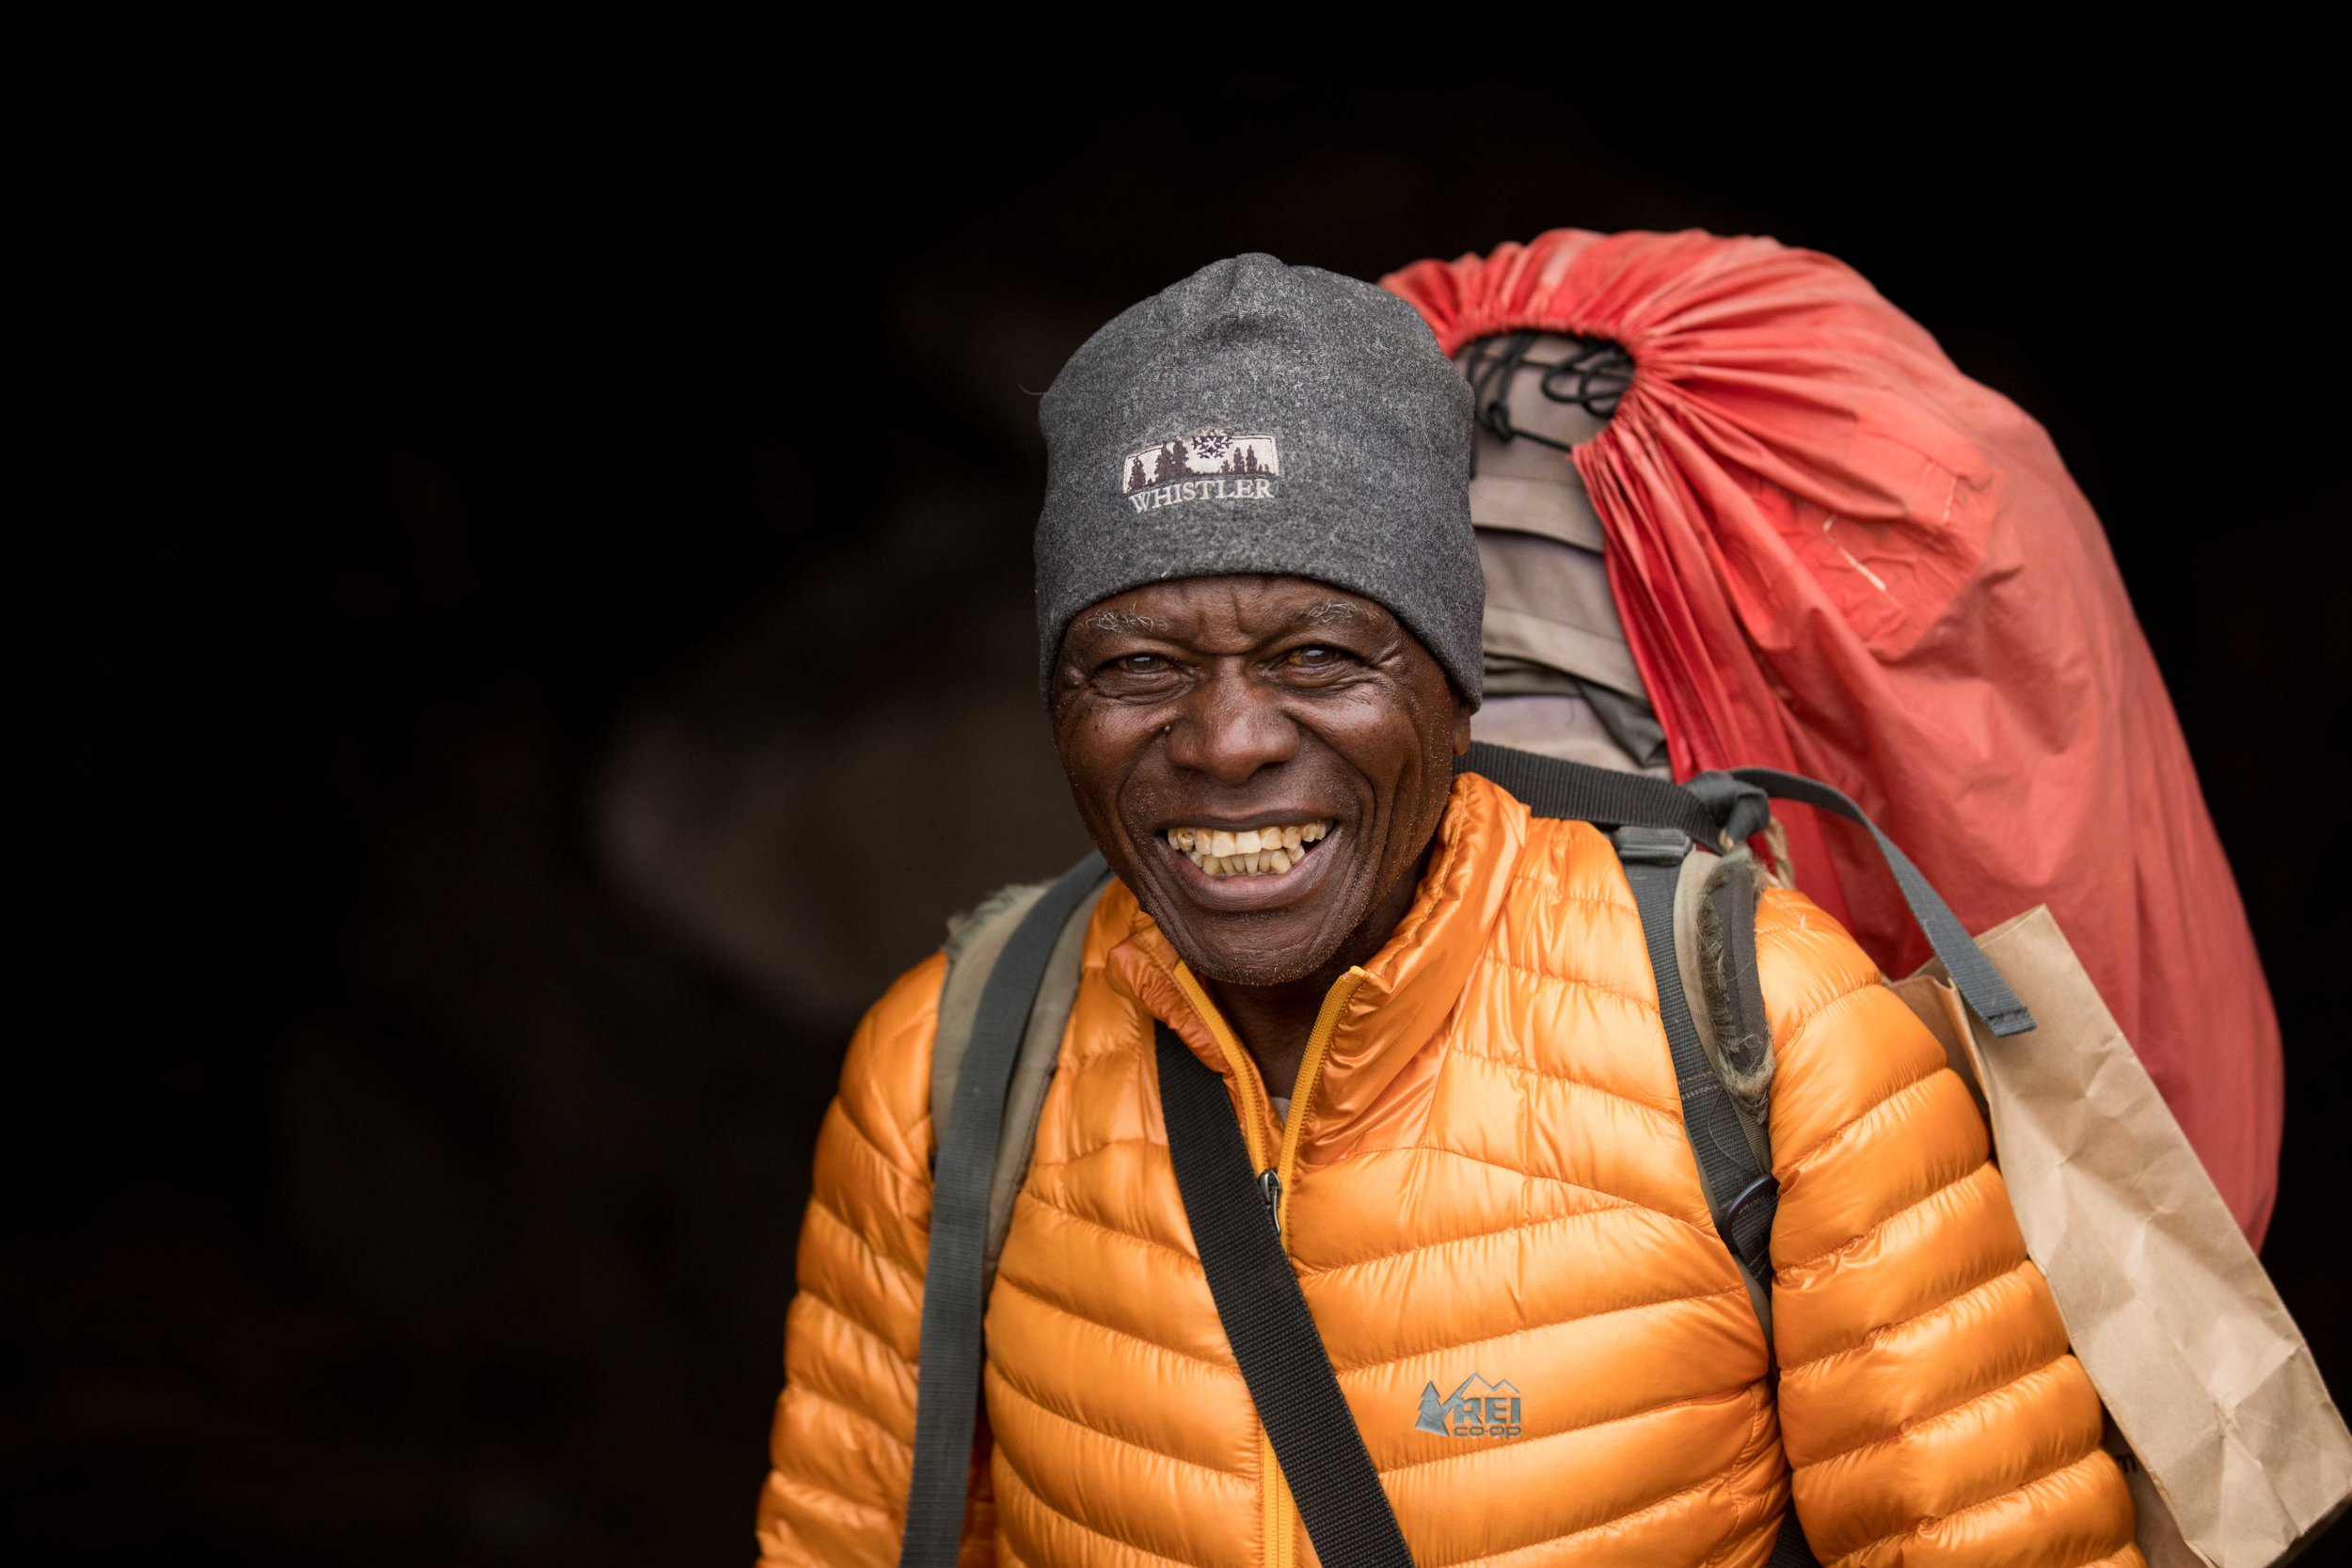 ajw_REI_Kilimanjaro-14.jpg